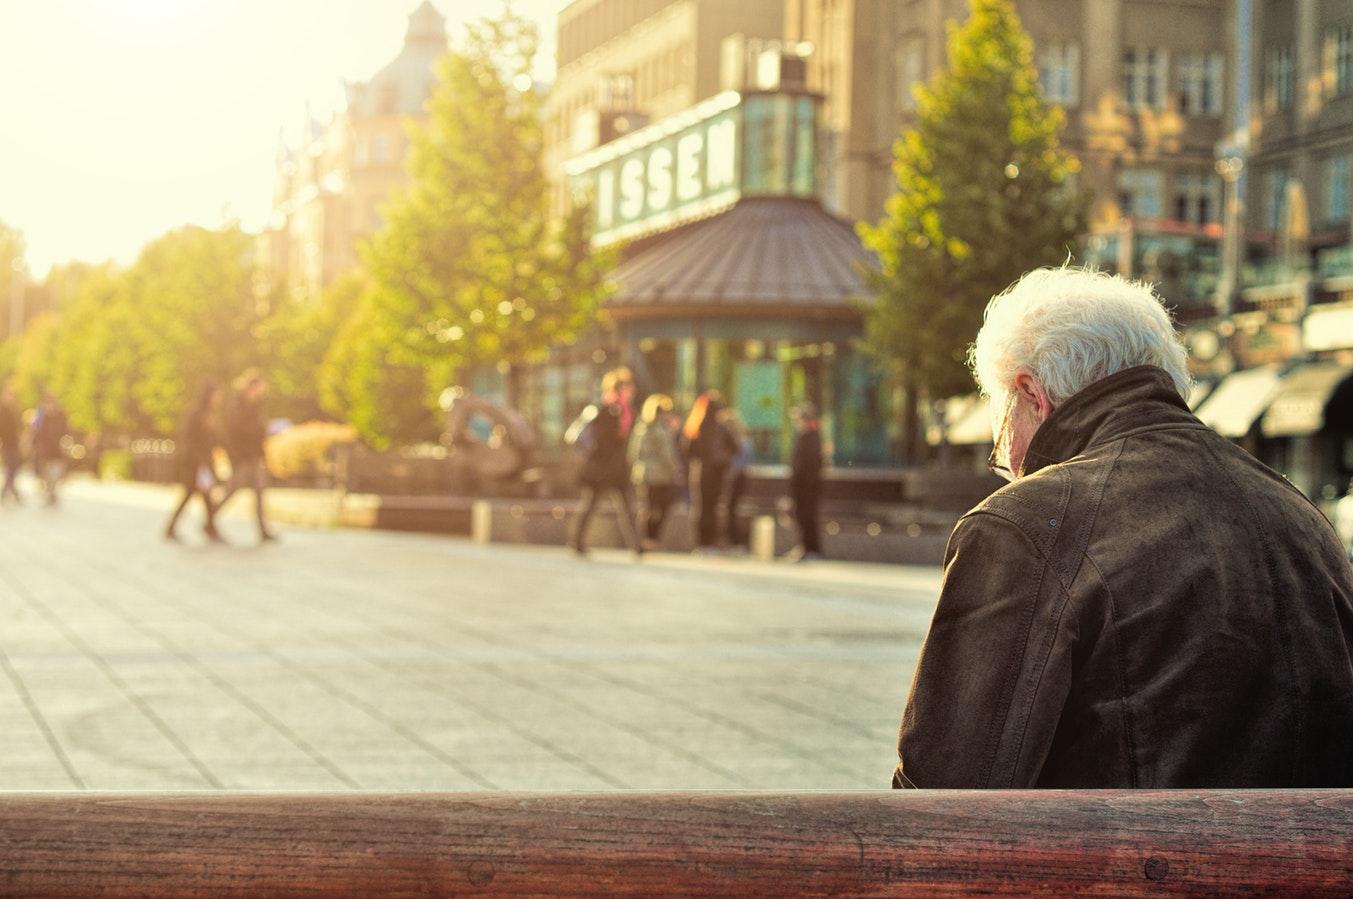 An older gentlemen sitting on a bench outside